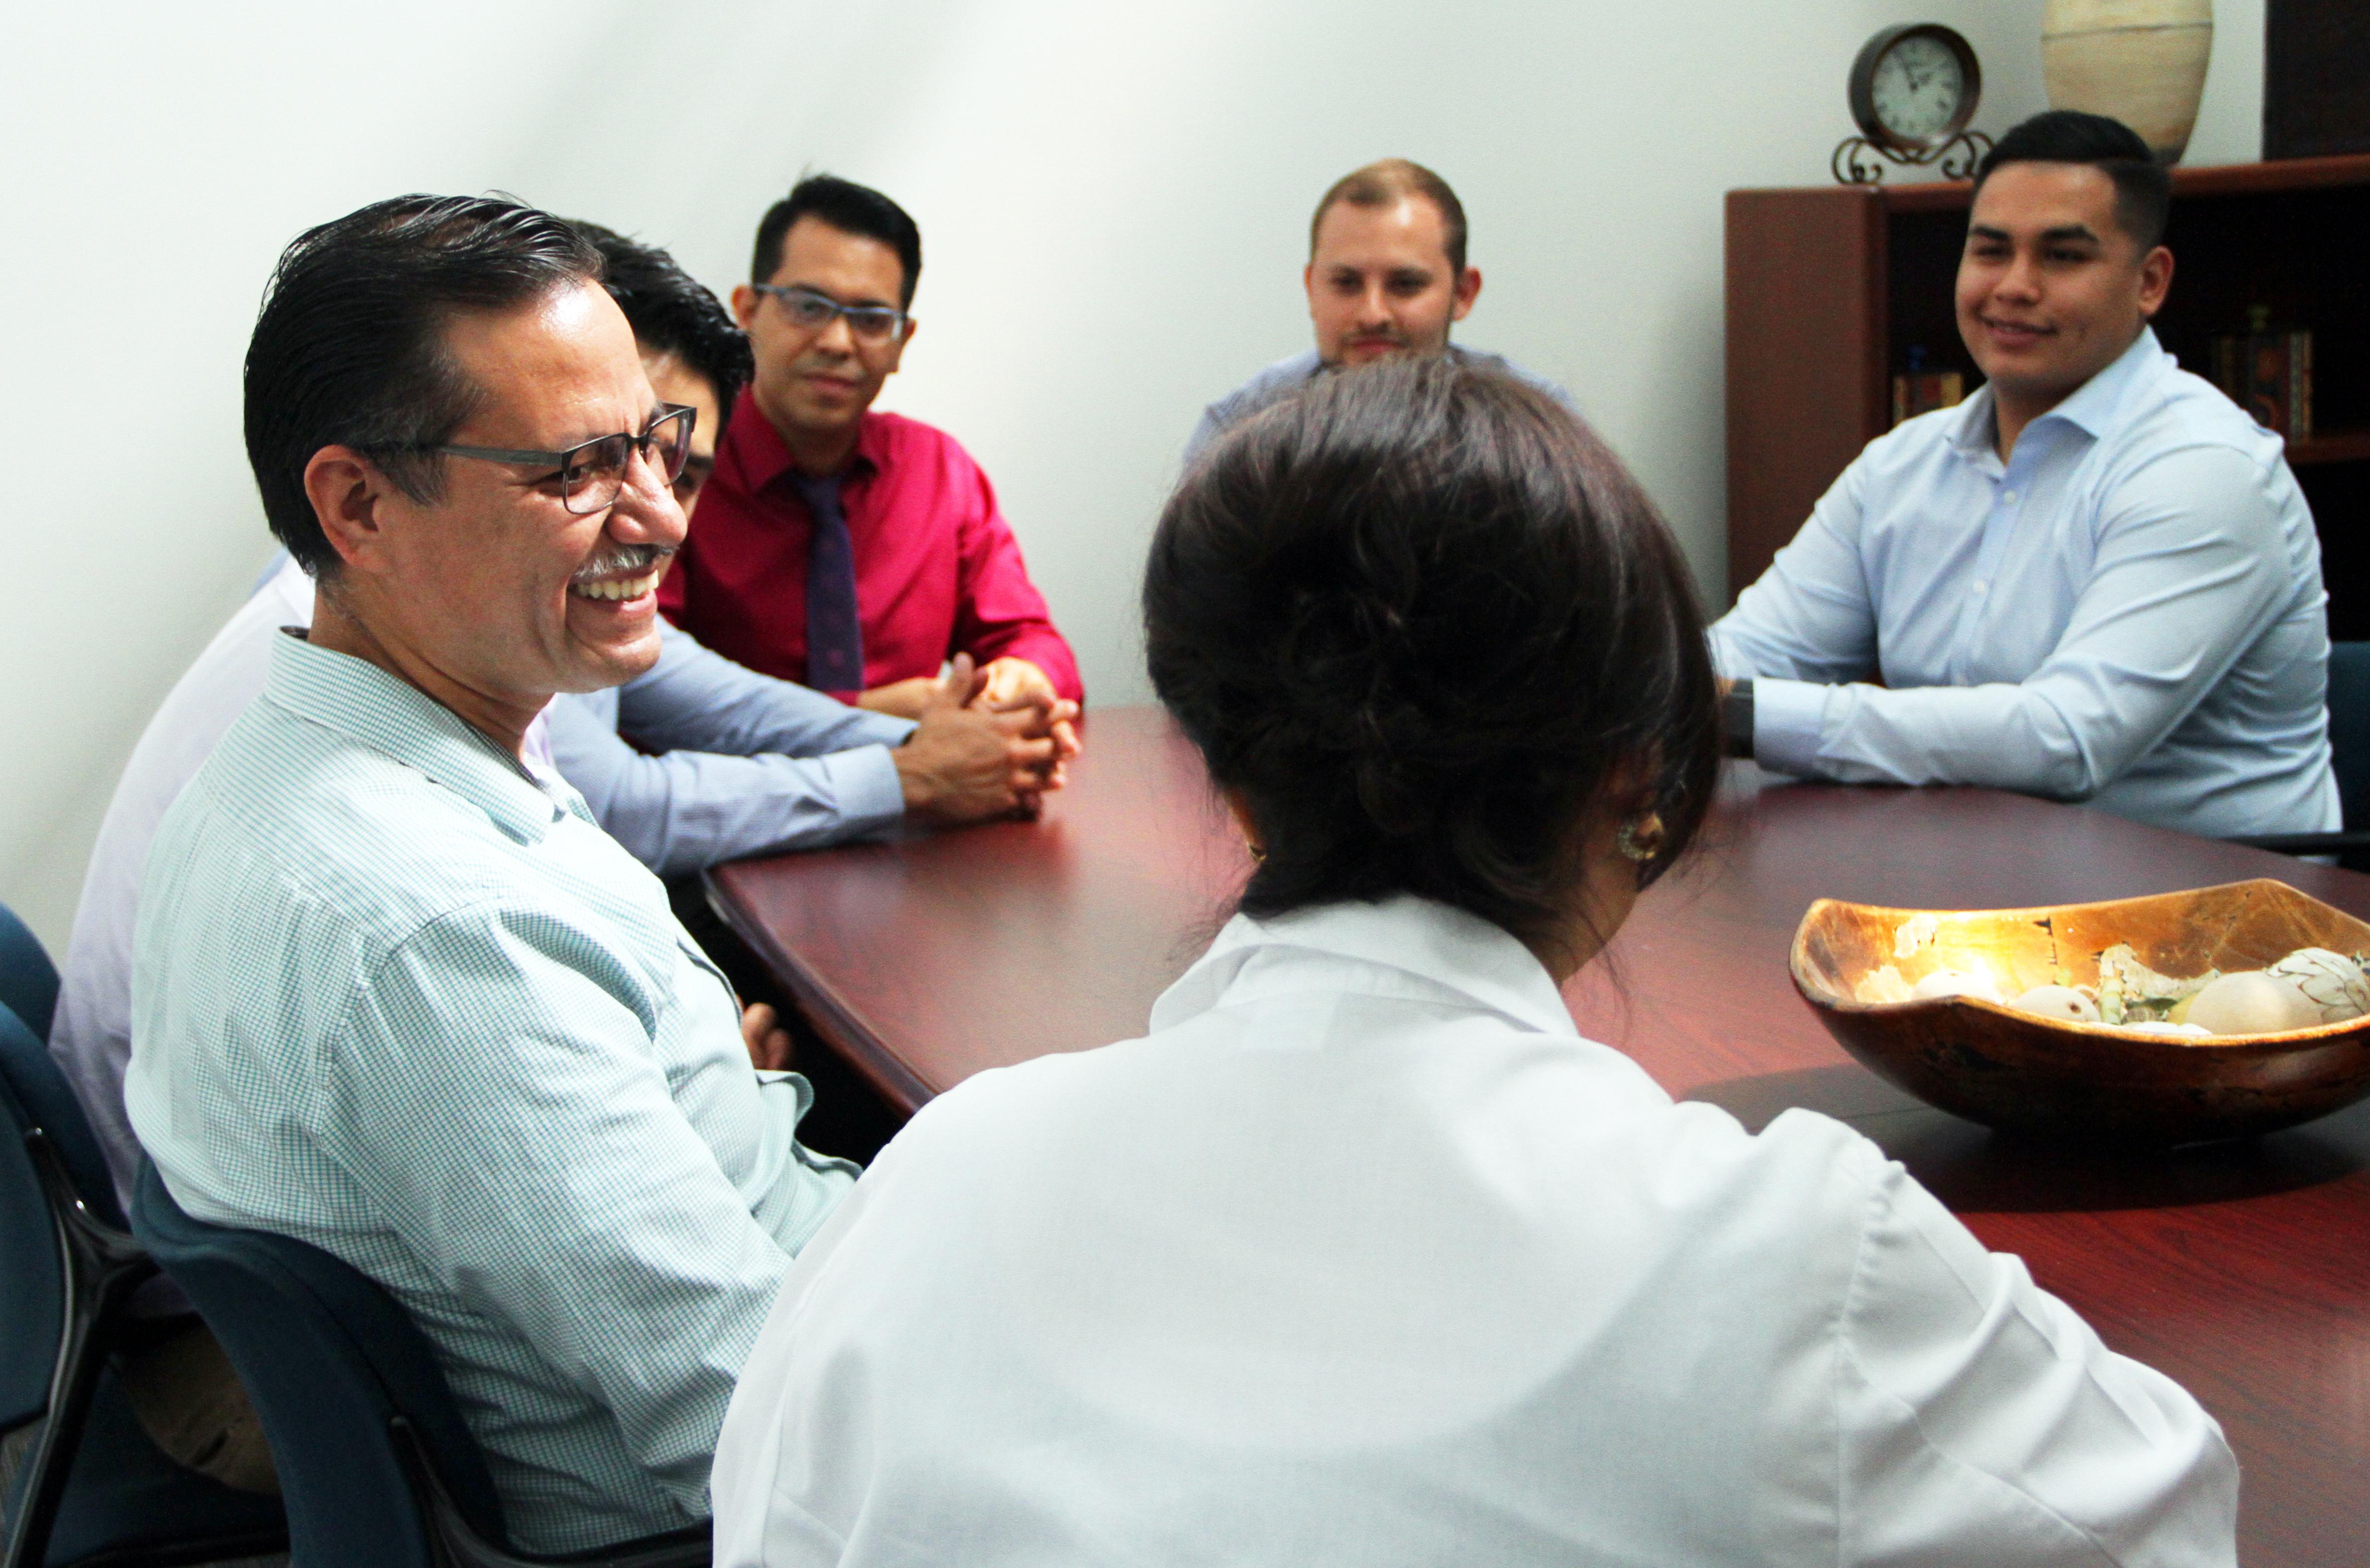 Program Trains Immigrant Doctors to Help Bridge Major Gaps